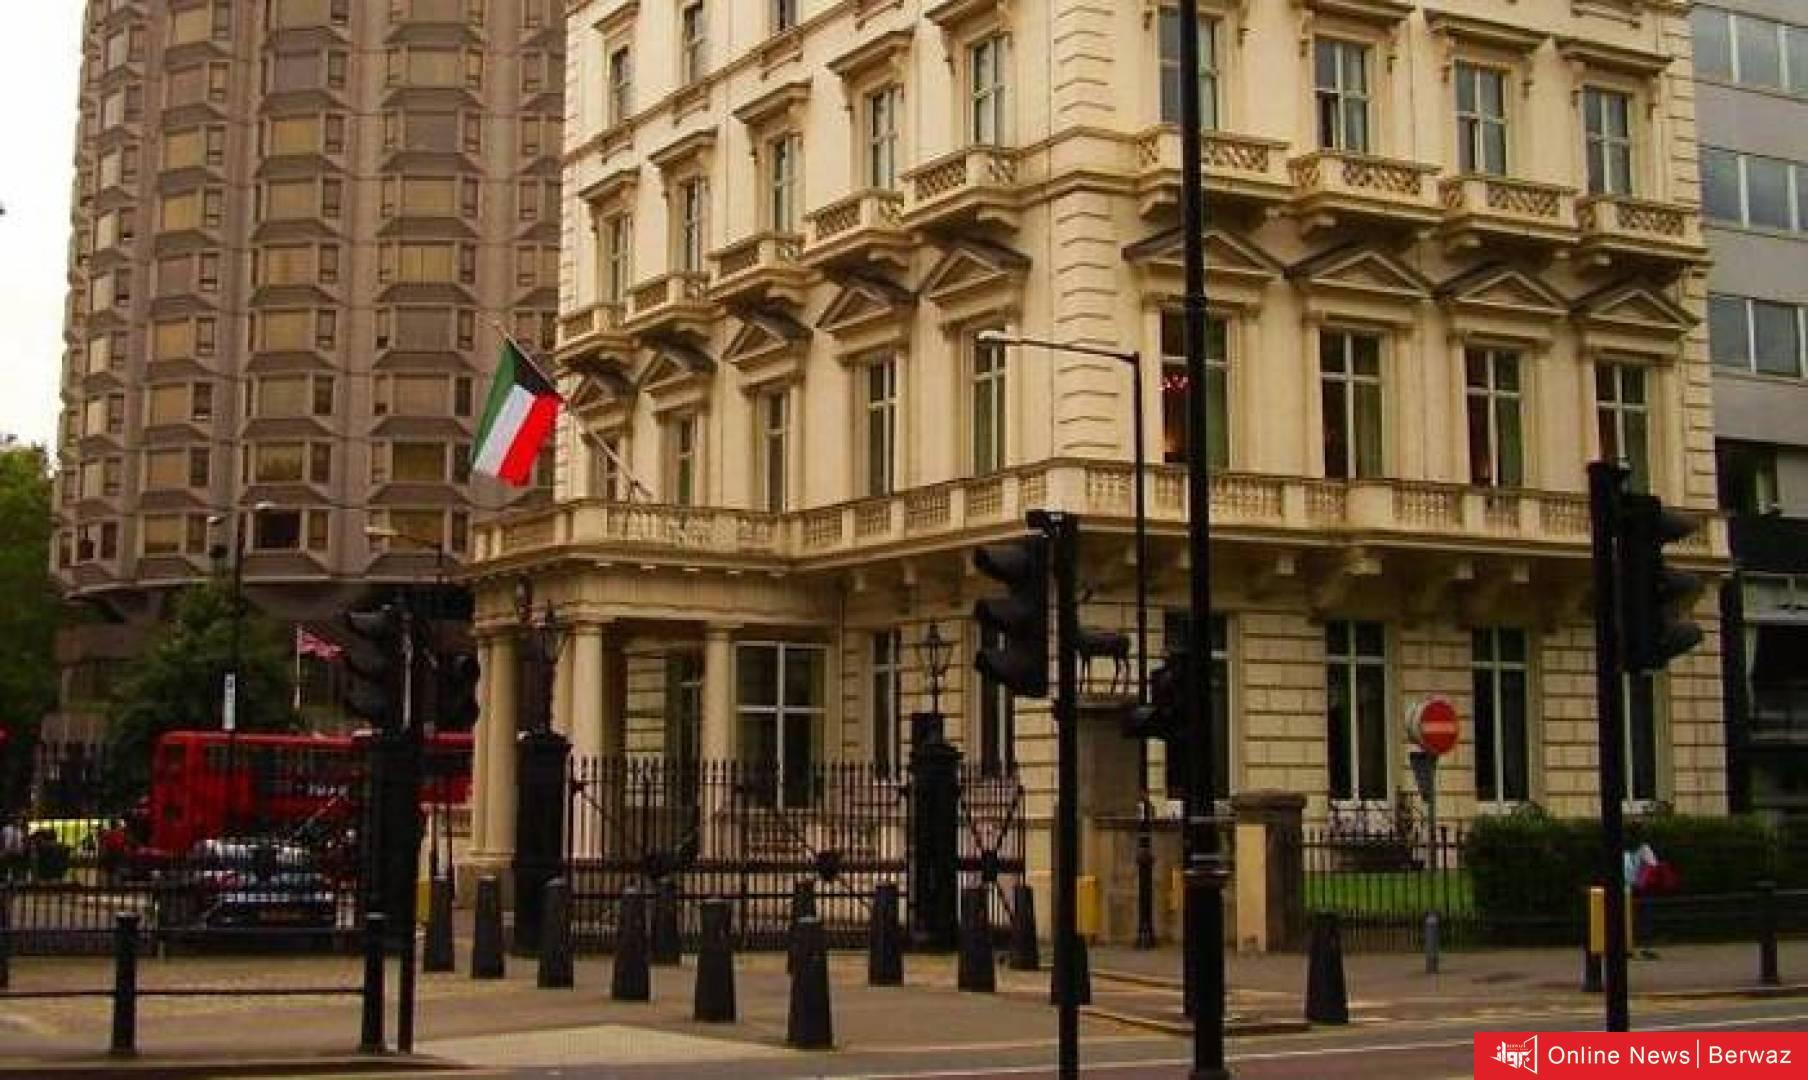 640x480 286079 highres - السفارة الكويتية بلندن تشدد على شهادة «بي.سي.ار» للراغبين بالسفر للكويت